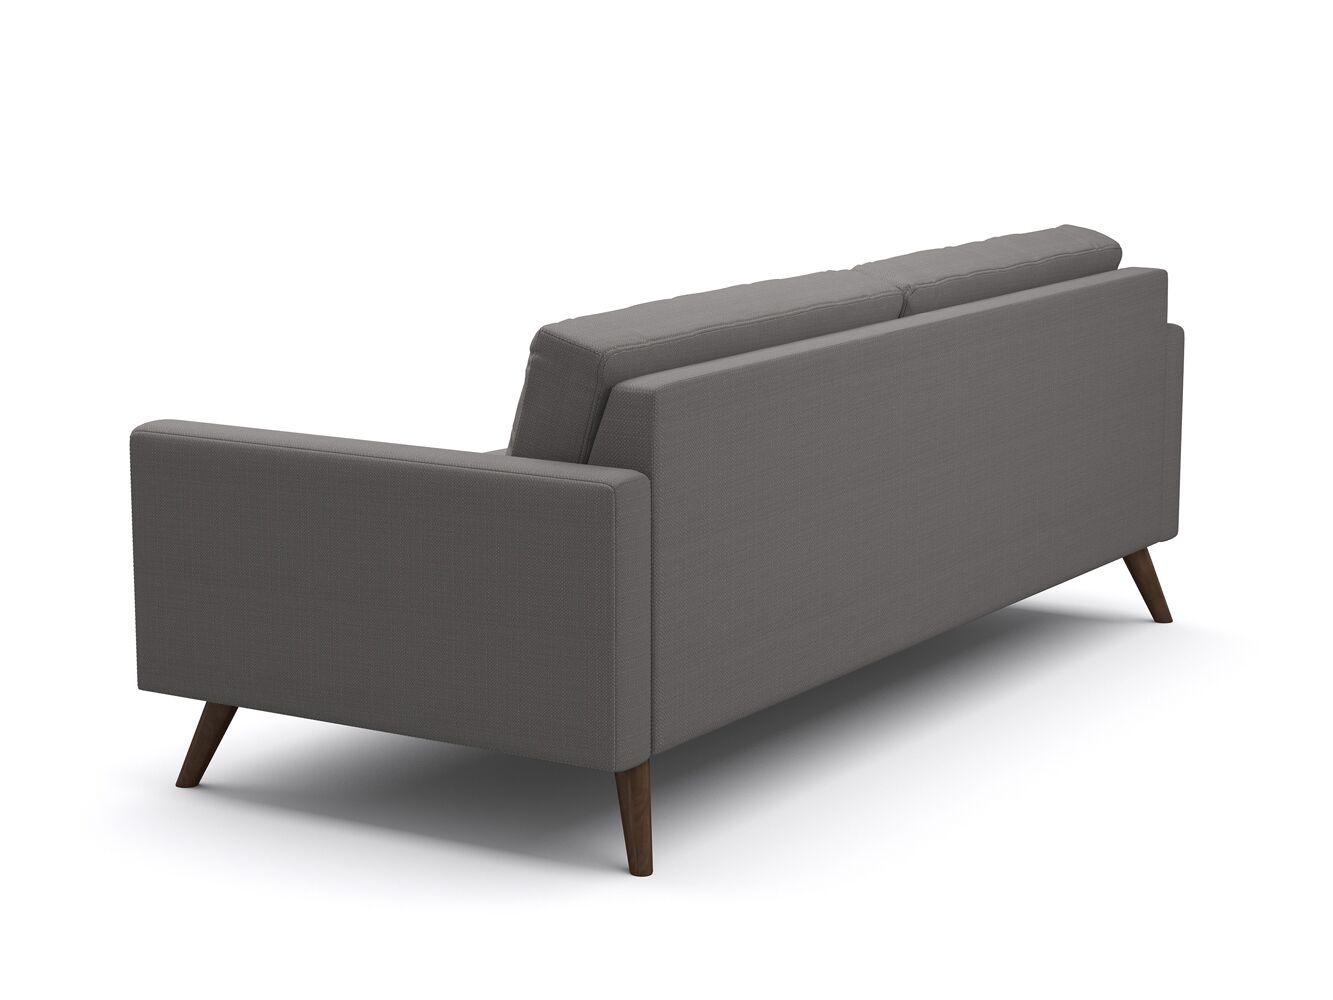 Dane Reversible Sectional Leg Color: Espresso, Body Fabric: Klein Laguna